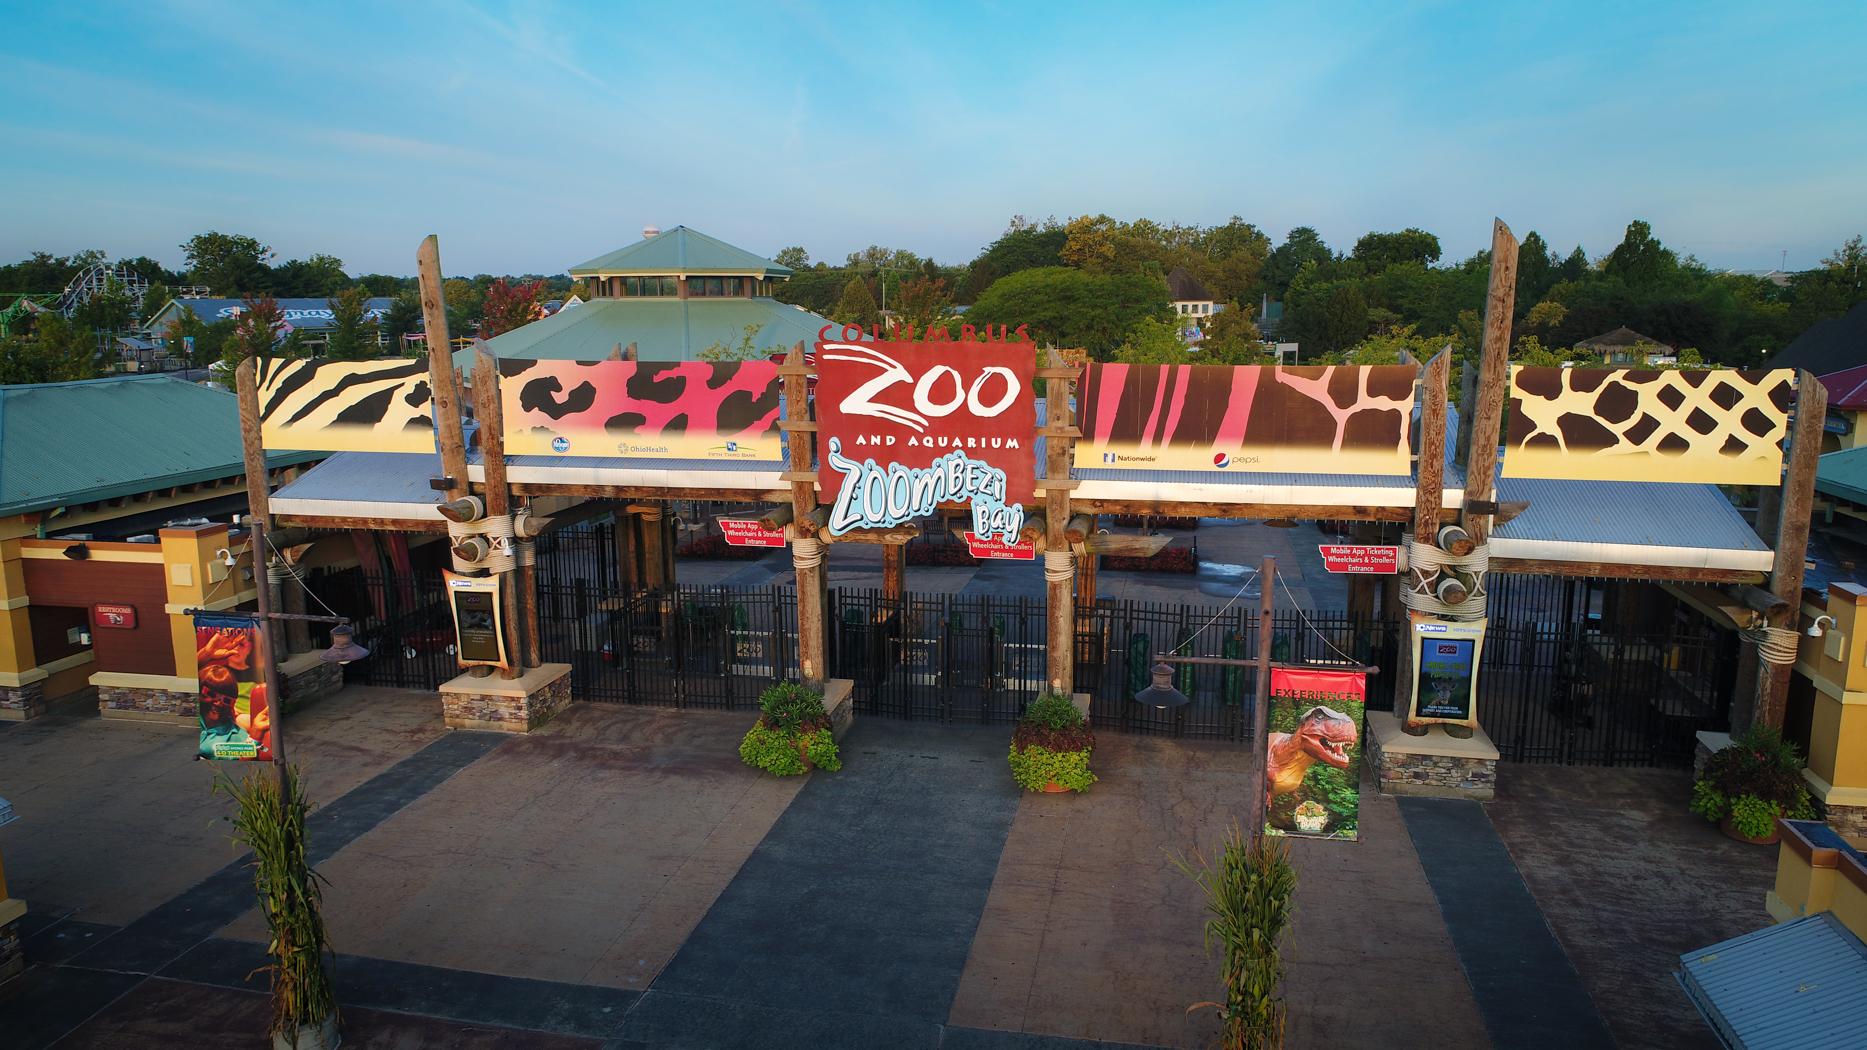 Entrance to Columbus Zoo and Aquarium and Zoombezi Bay adventure park